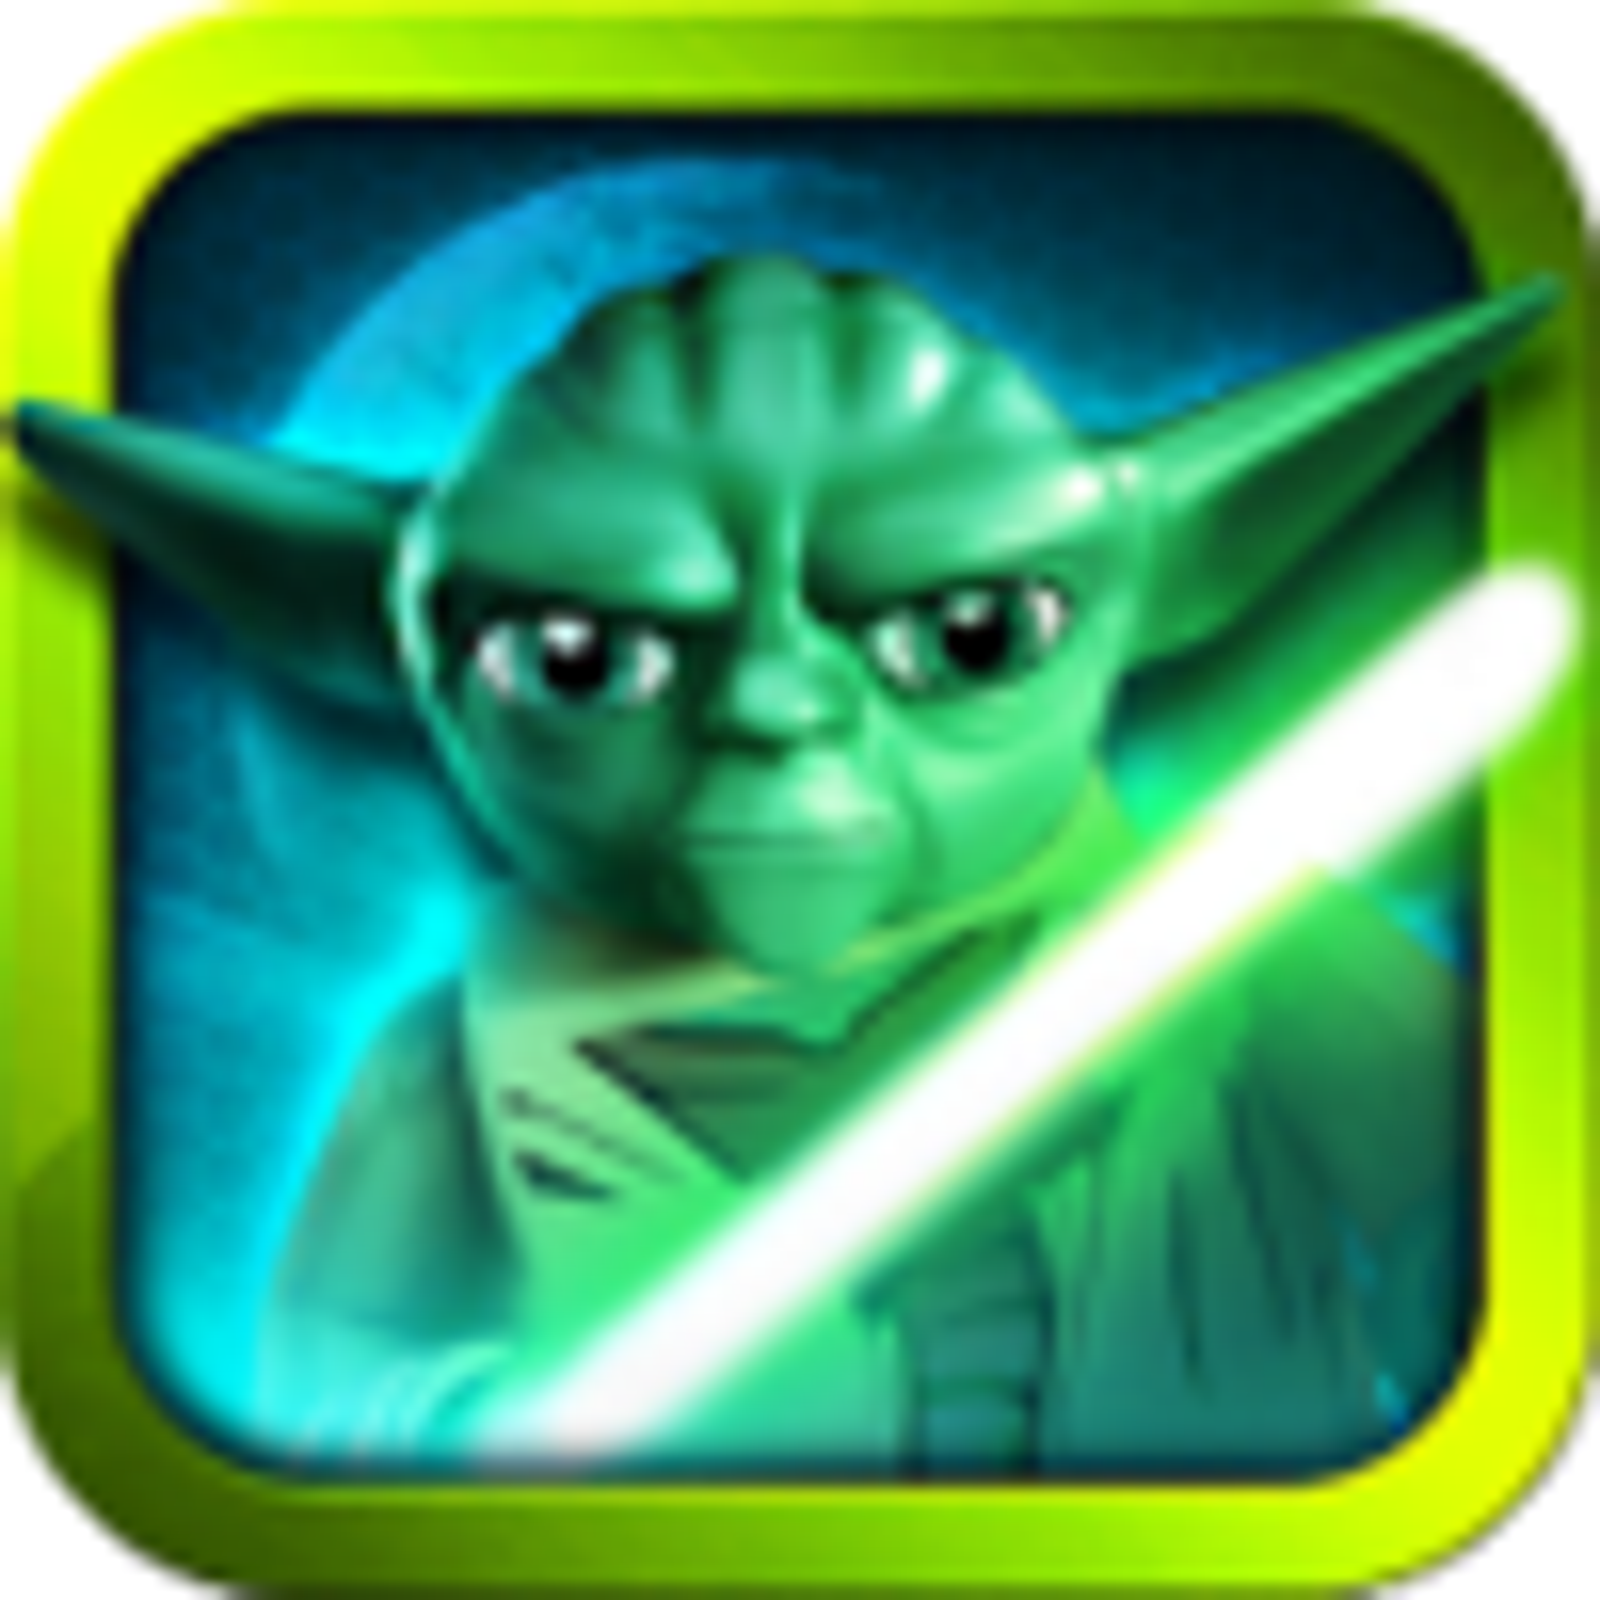 LEGO Star Wars The Yoda Chronicles 1.2